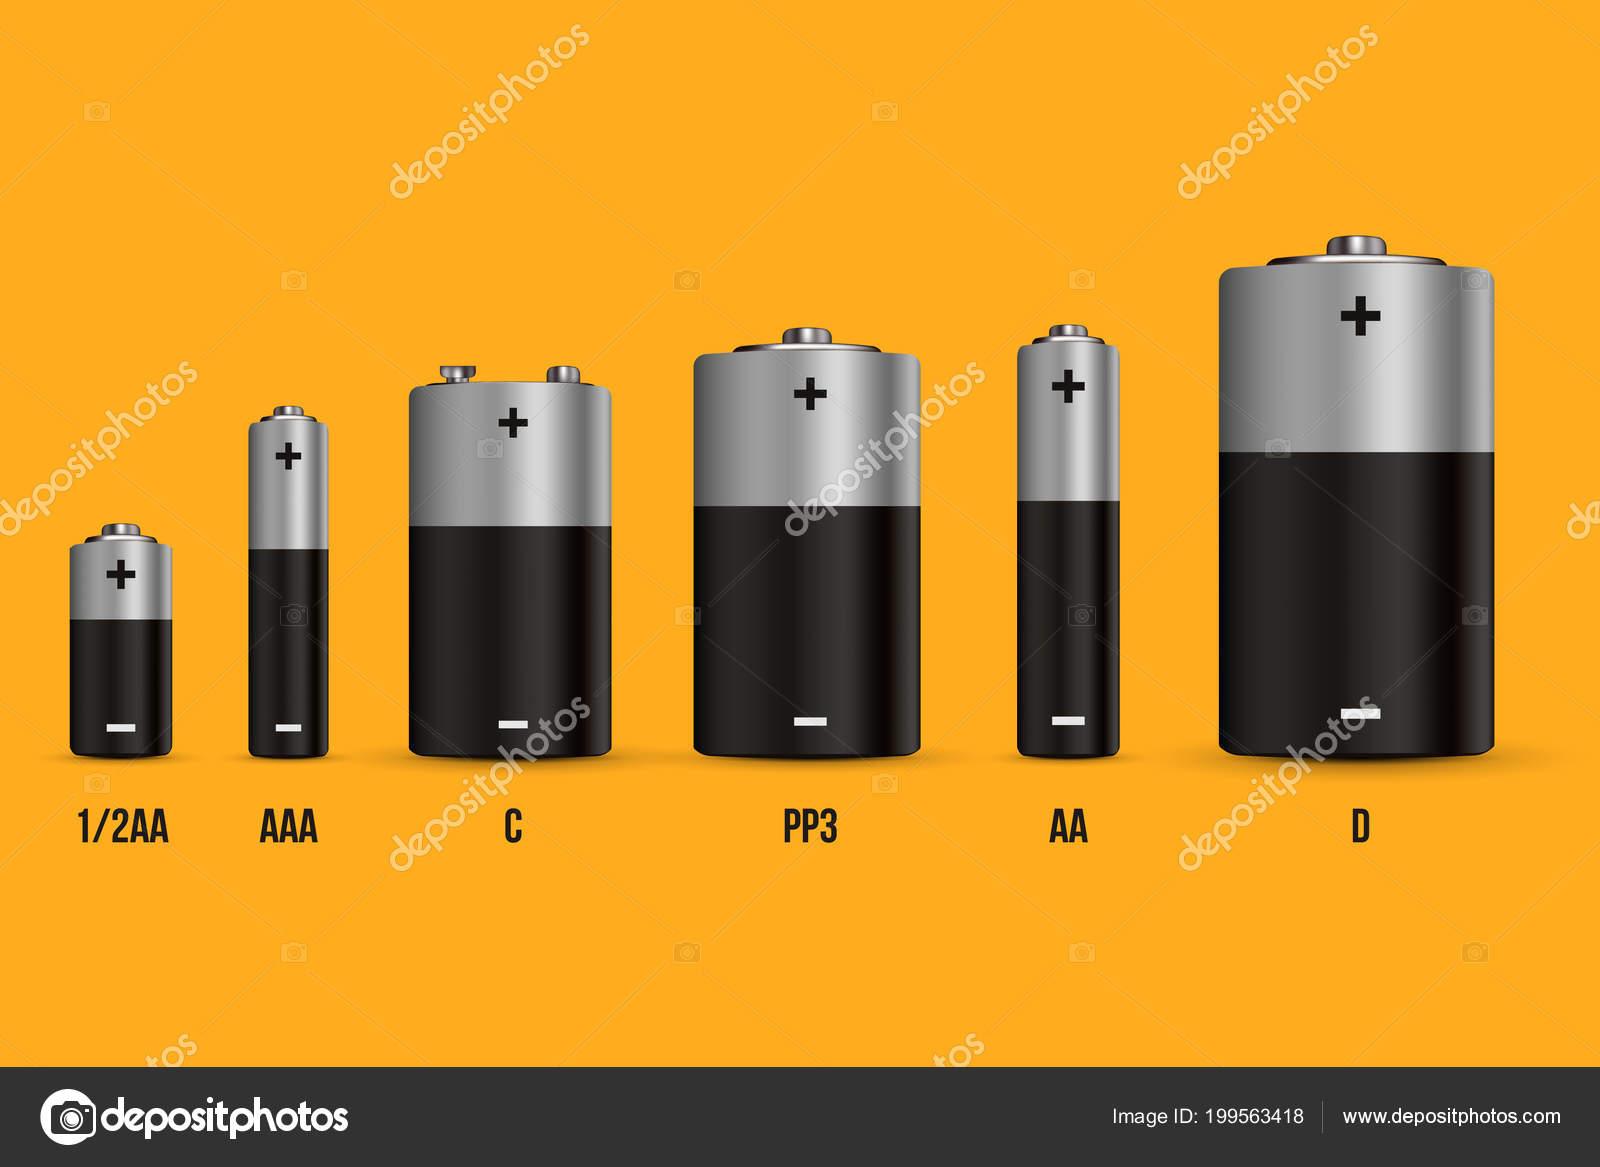 Creative Vector Illustration Realistic Alkaline Battery Set Diffrent Size Isolated Stock Vector C Mikhail Grachikov 199563418